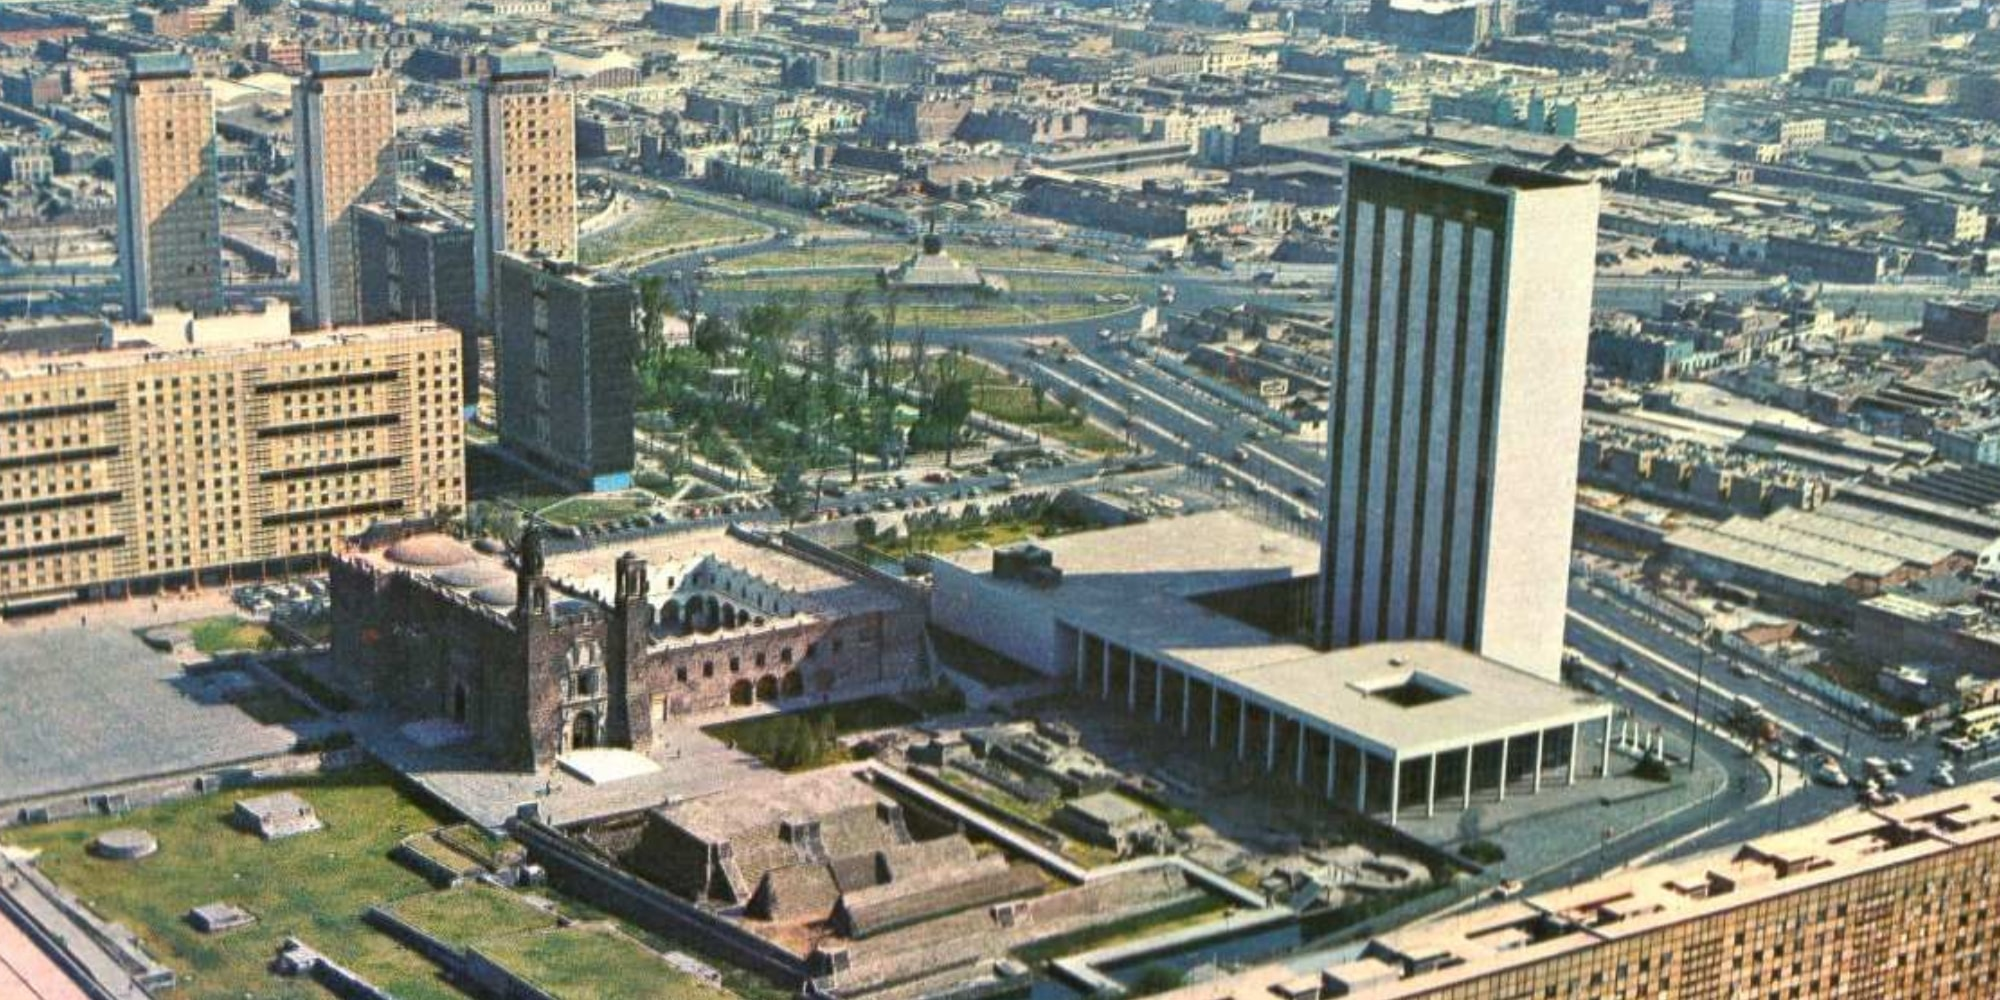 FOTOS  Así era la Ciudad de México en la década de 1960 93a33d9c1b24